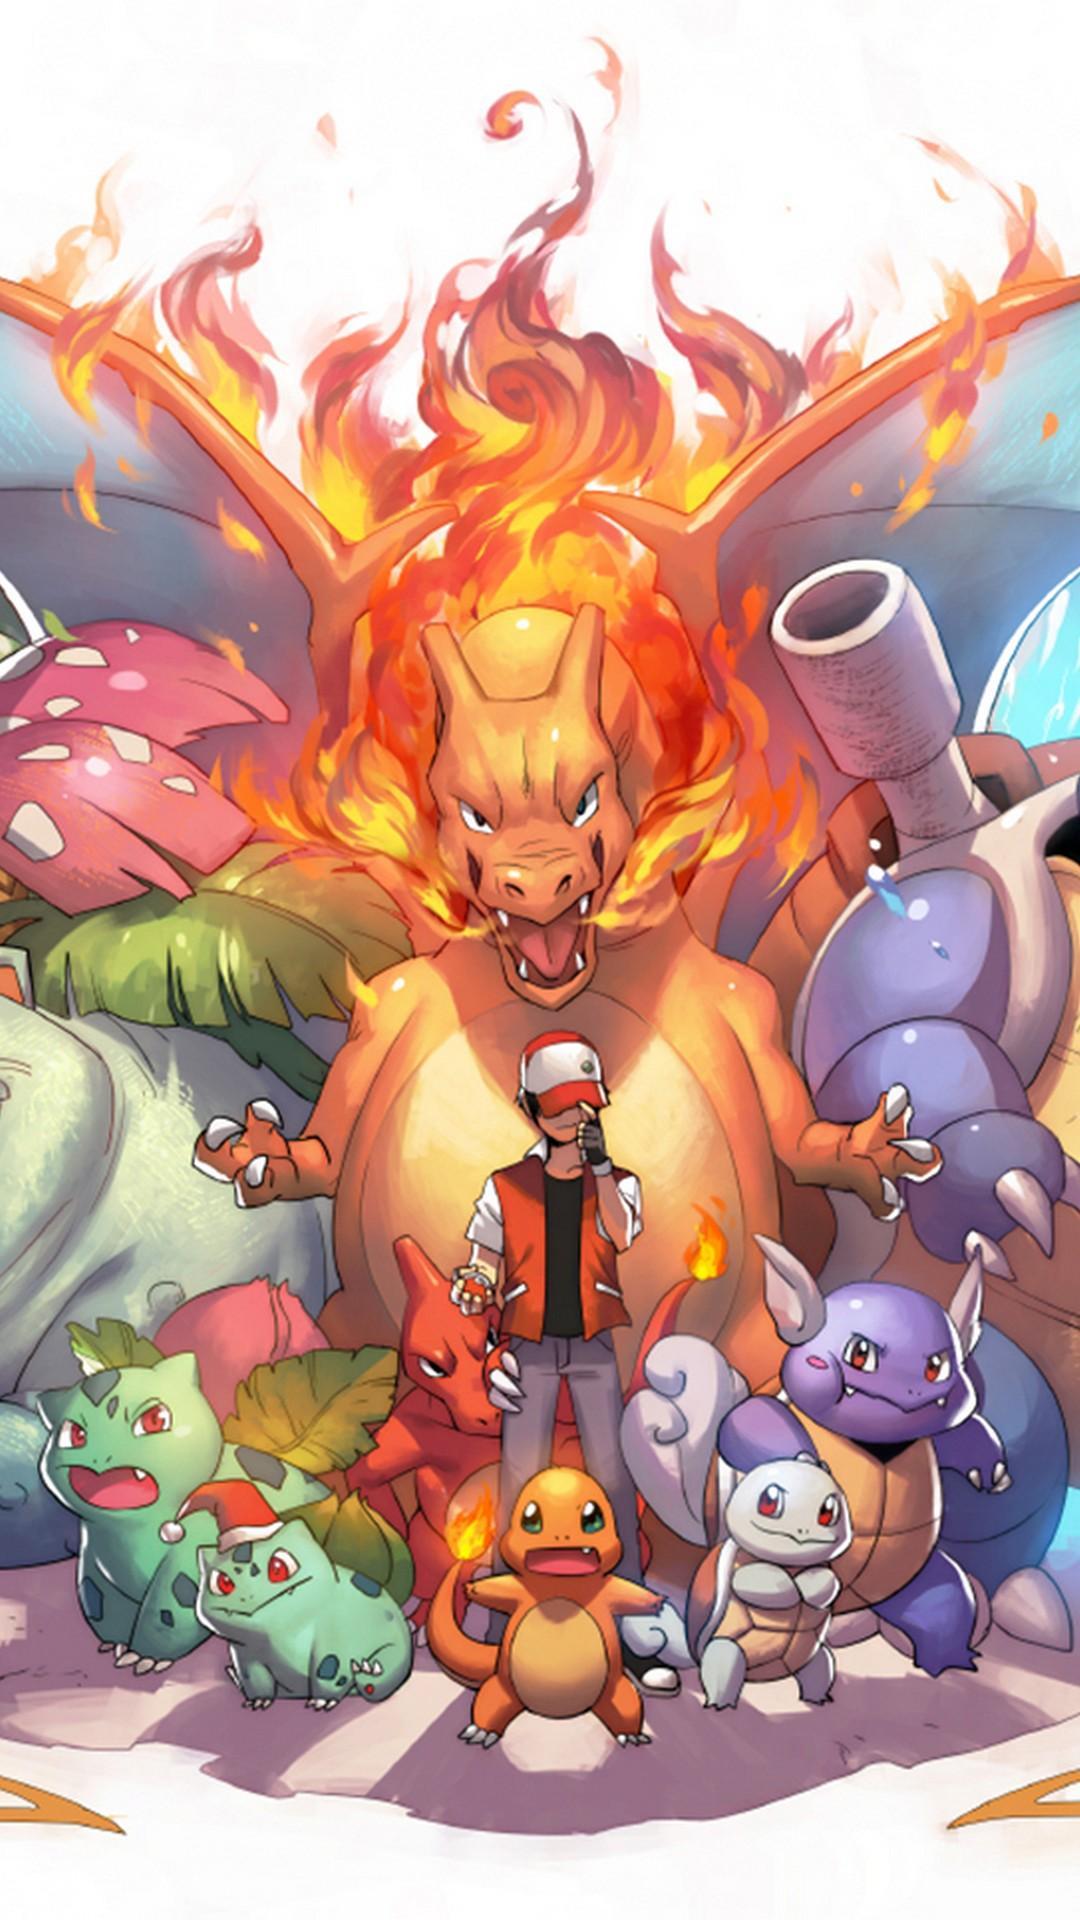 12 Pokémon Wallpapers   Wallpaper Cave